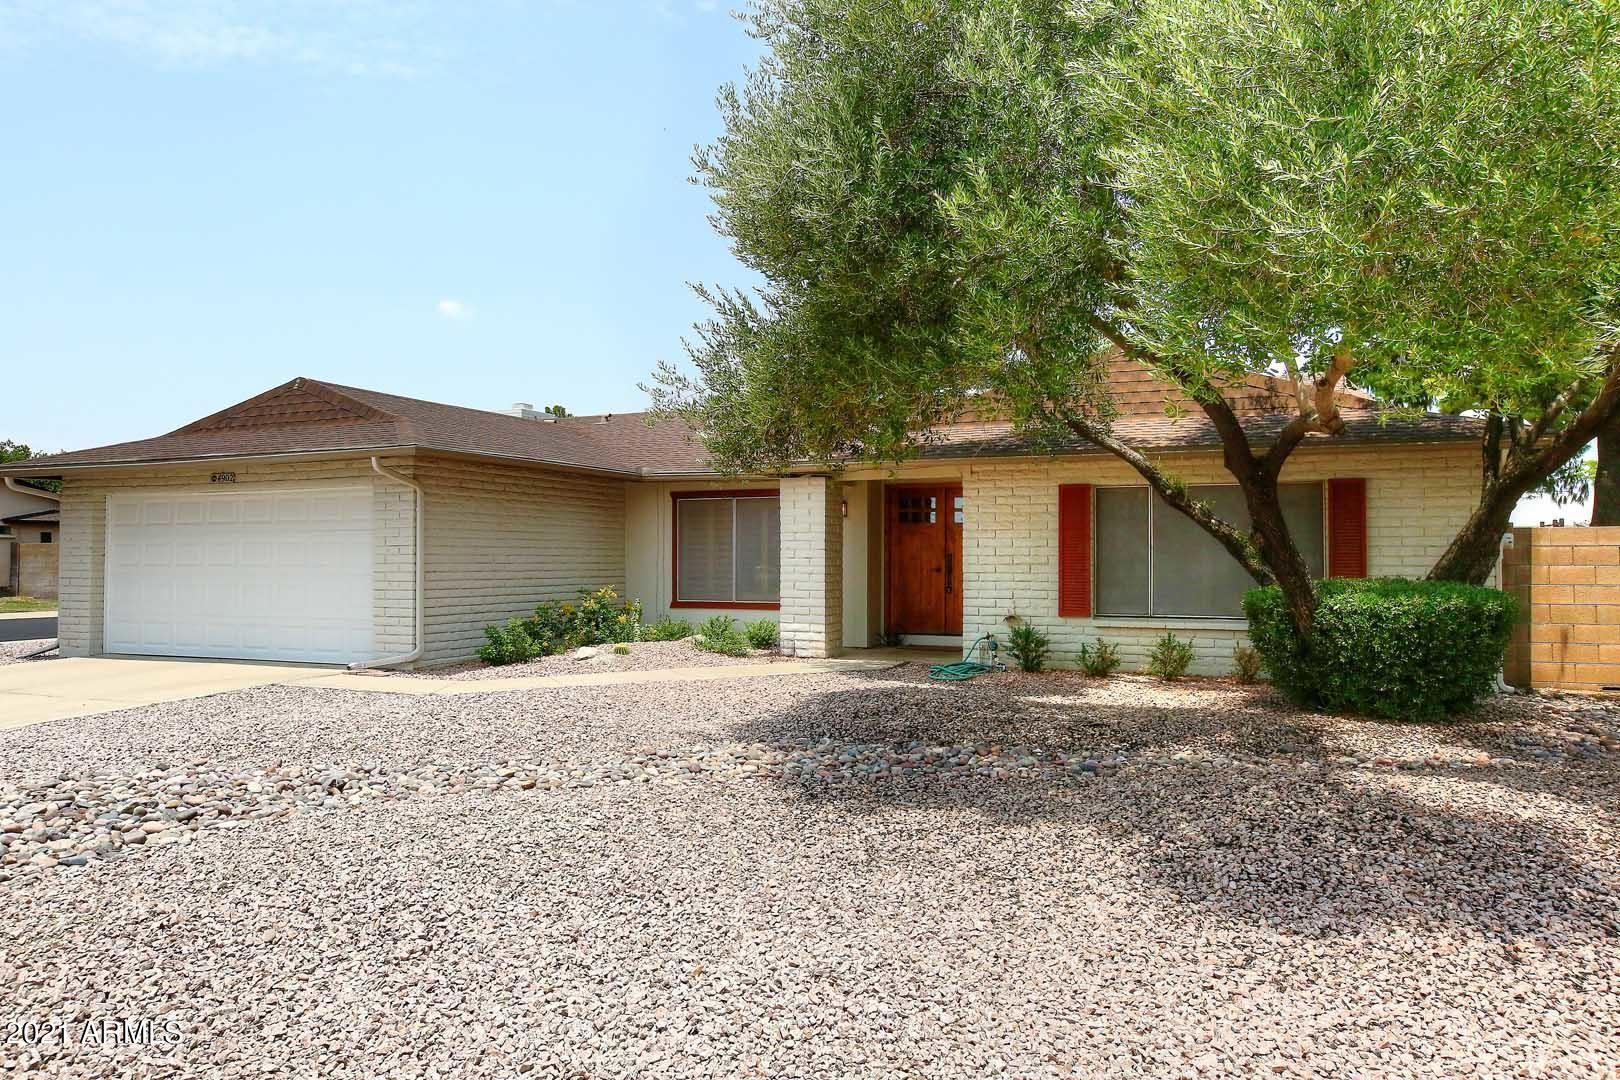 4902 E CROCUS Drive, Scottsdale, AZ 85254 - MLS#: 6266055